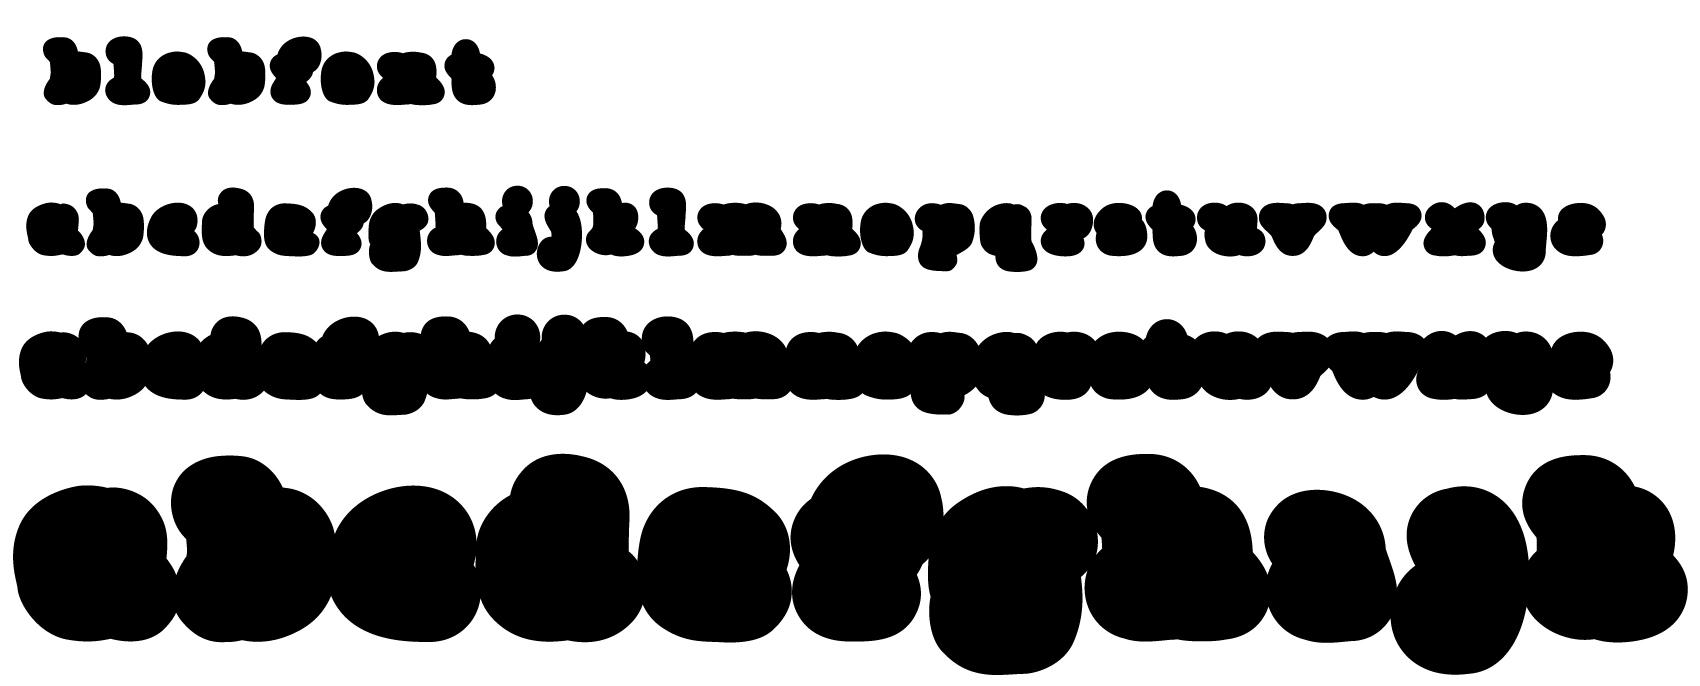 blob-alphabet